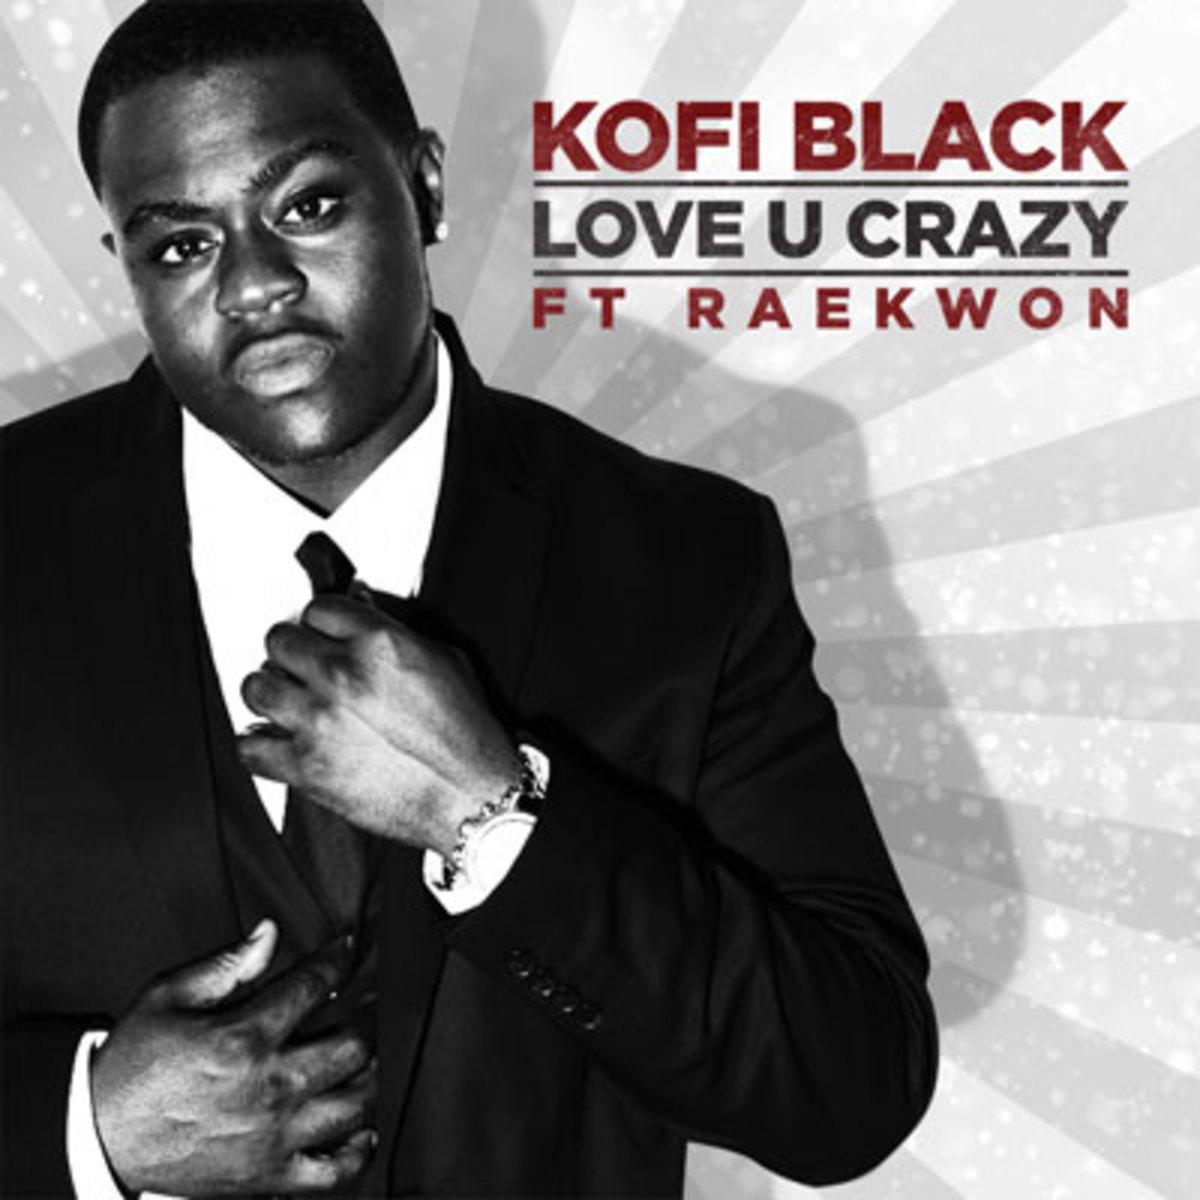 kofiblack-loveucrazy.jpg